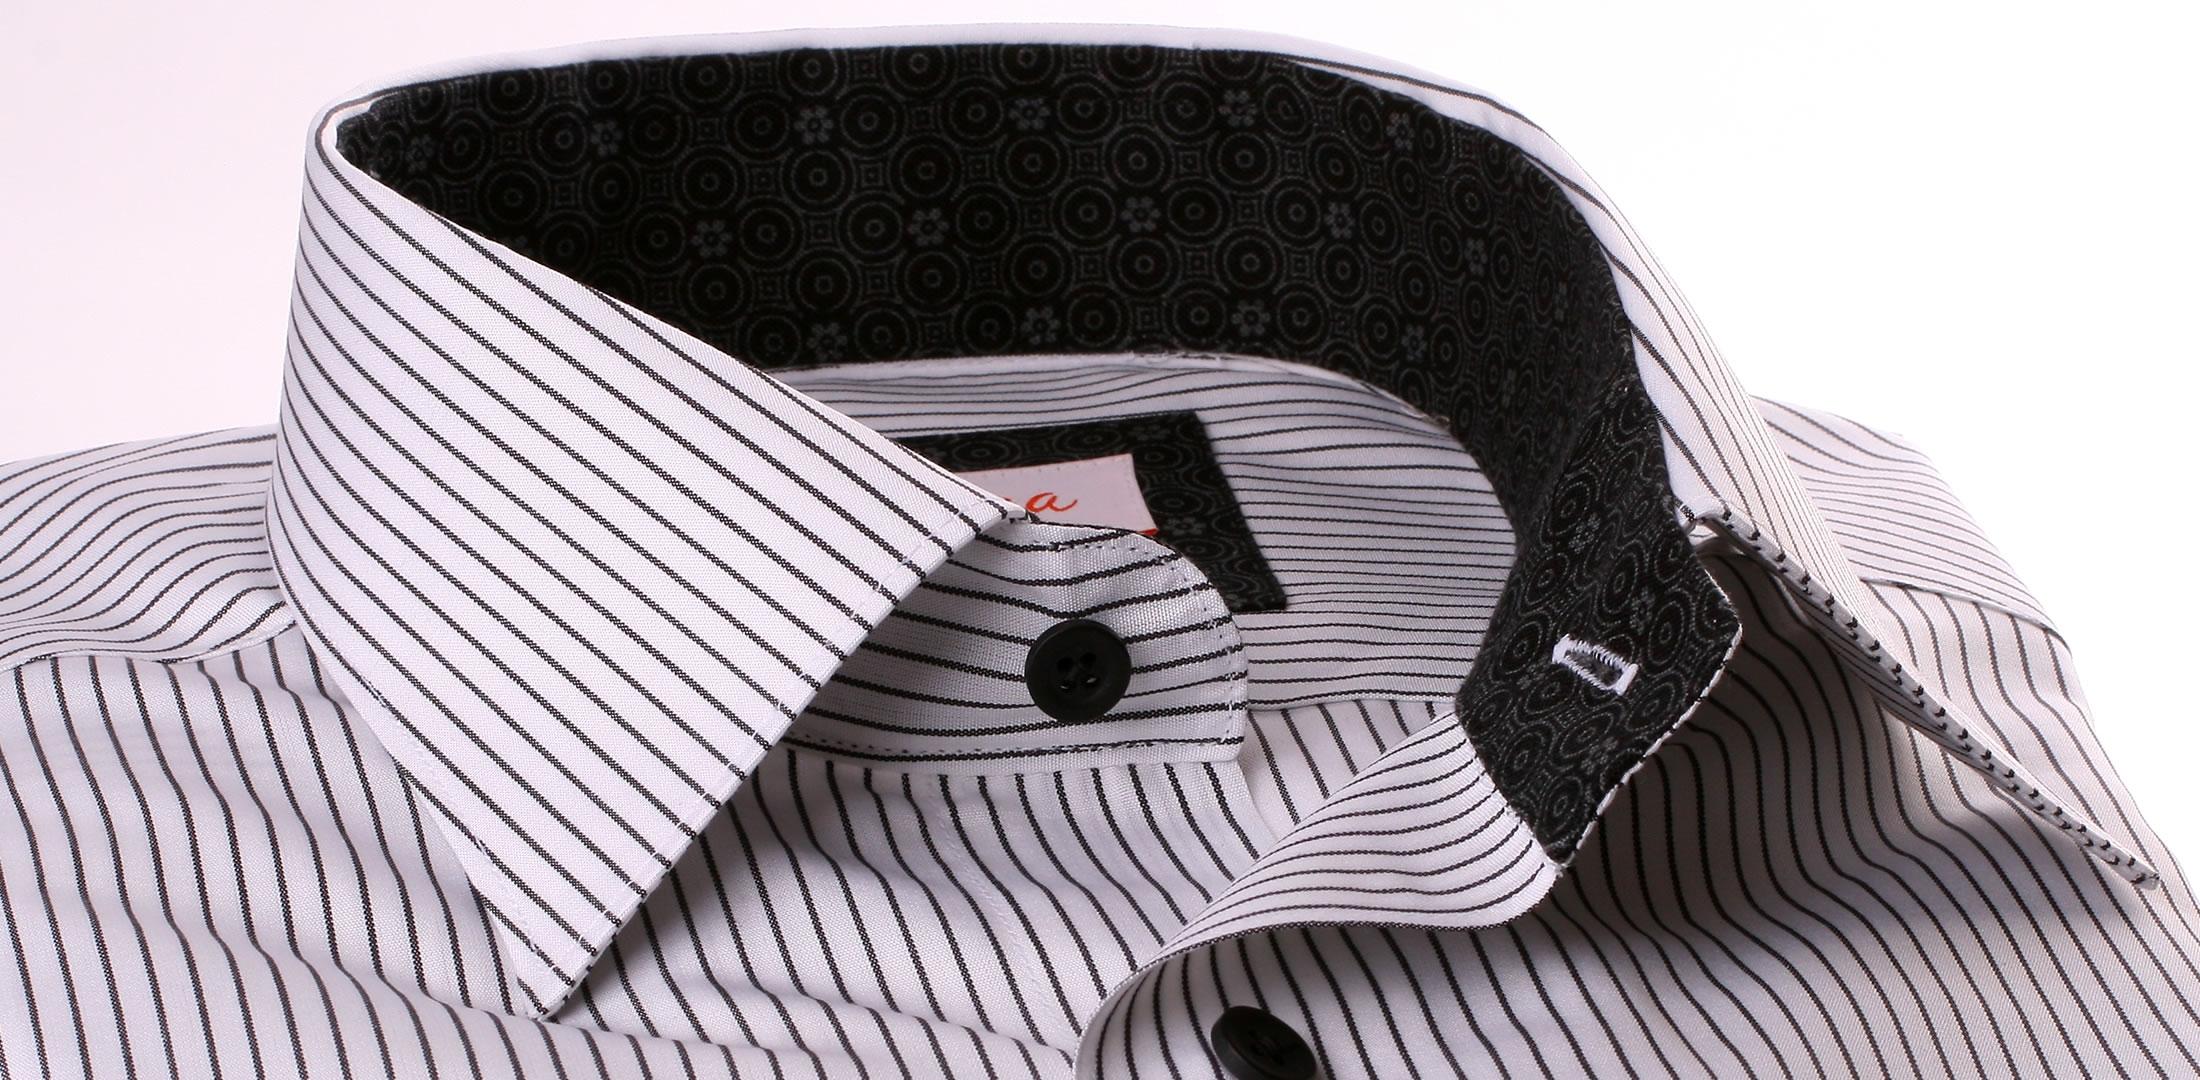 la chemise hemden wei e hemden klassische hemden fashion hemden. Black Bedroom Furniture Sets. Home Design Ideas